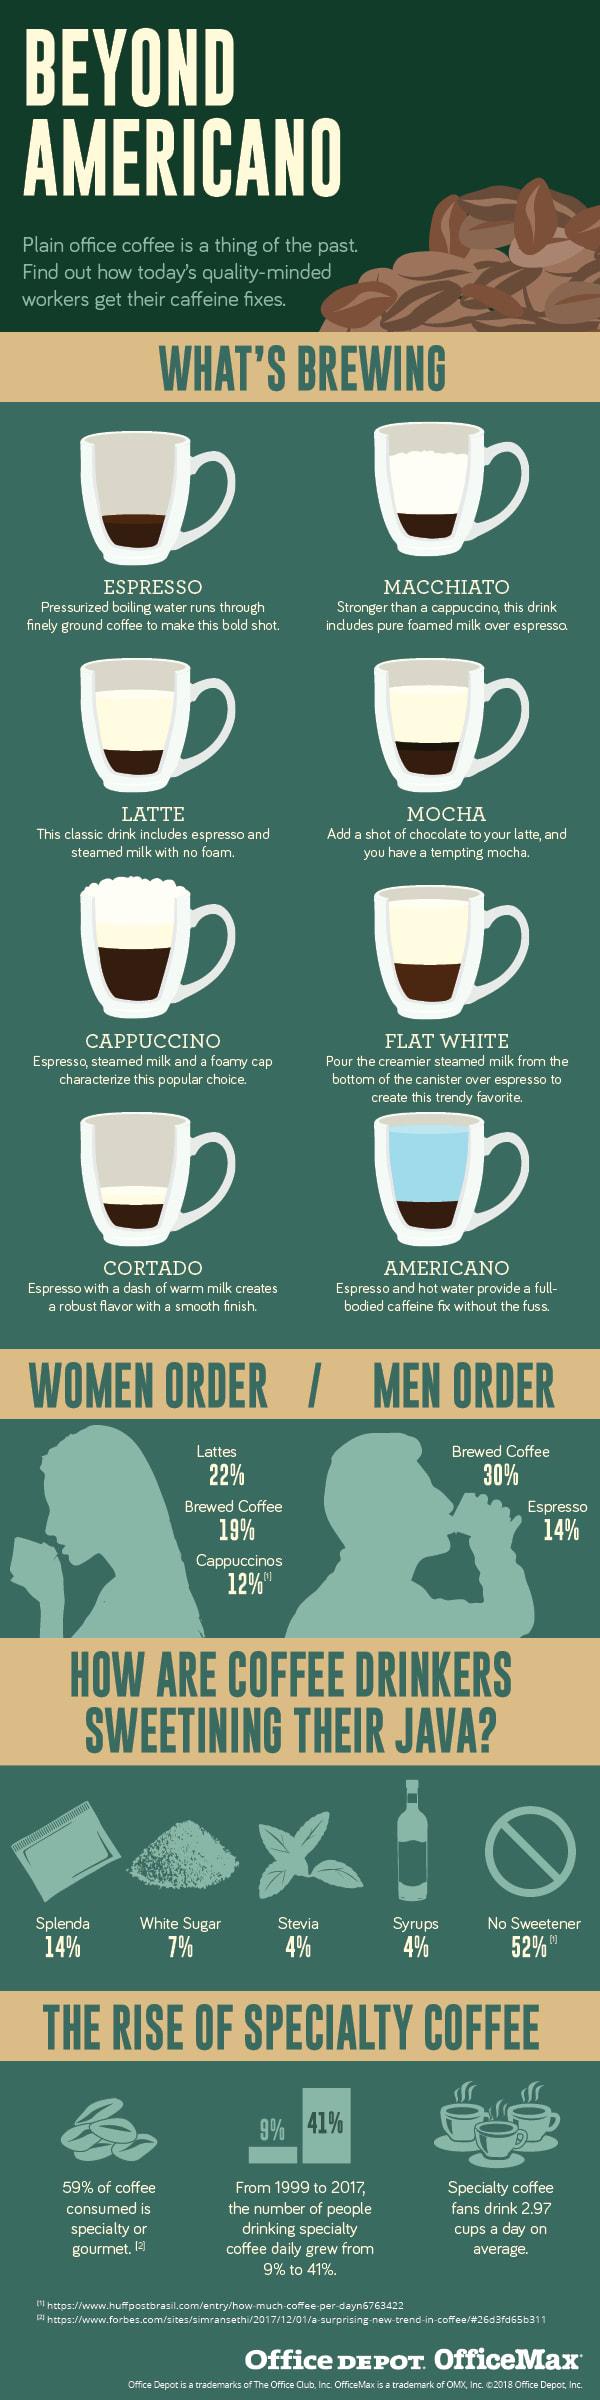 Beyond Americano Infographic